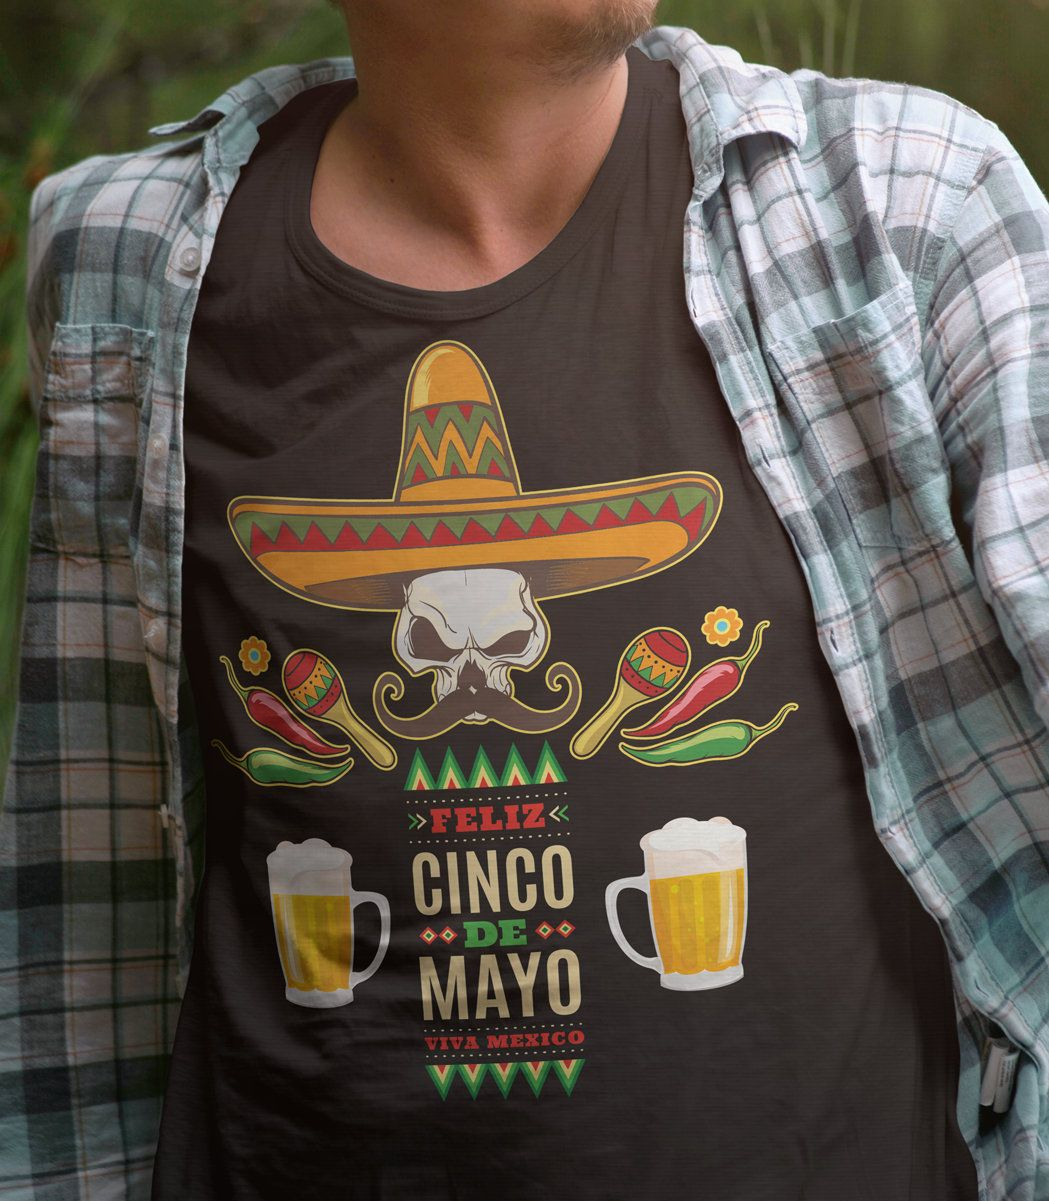 Cinco de mayo cinco shirt party t shirt mexican holiday